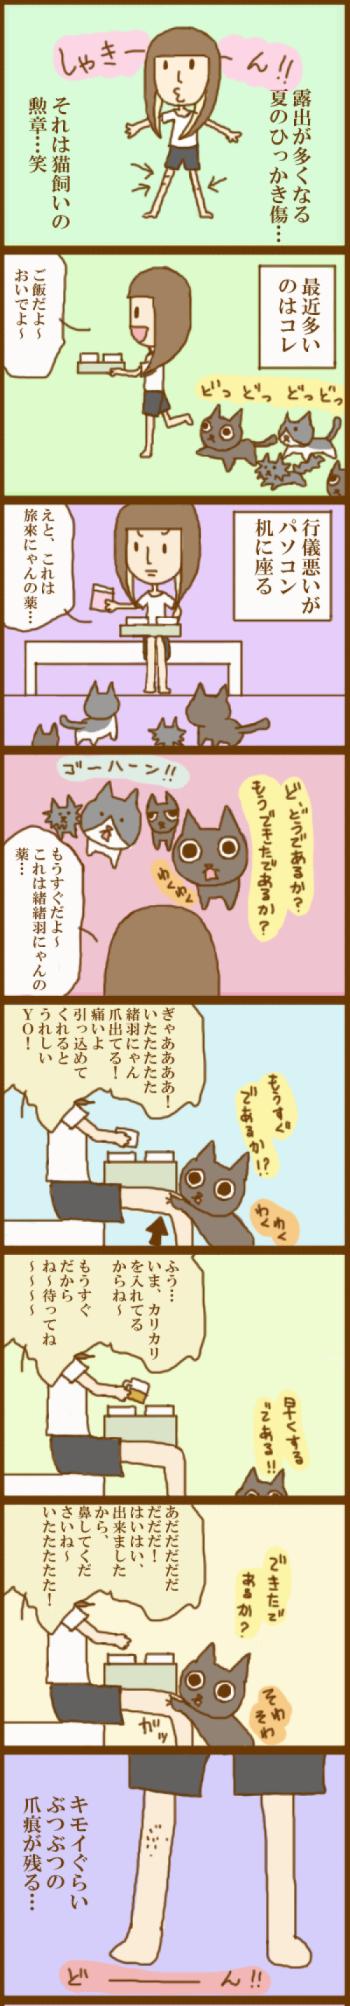 f:id:suzuokayu:20201119104515j:plain